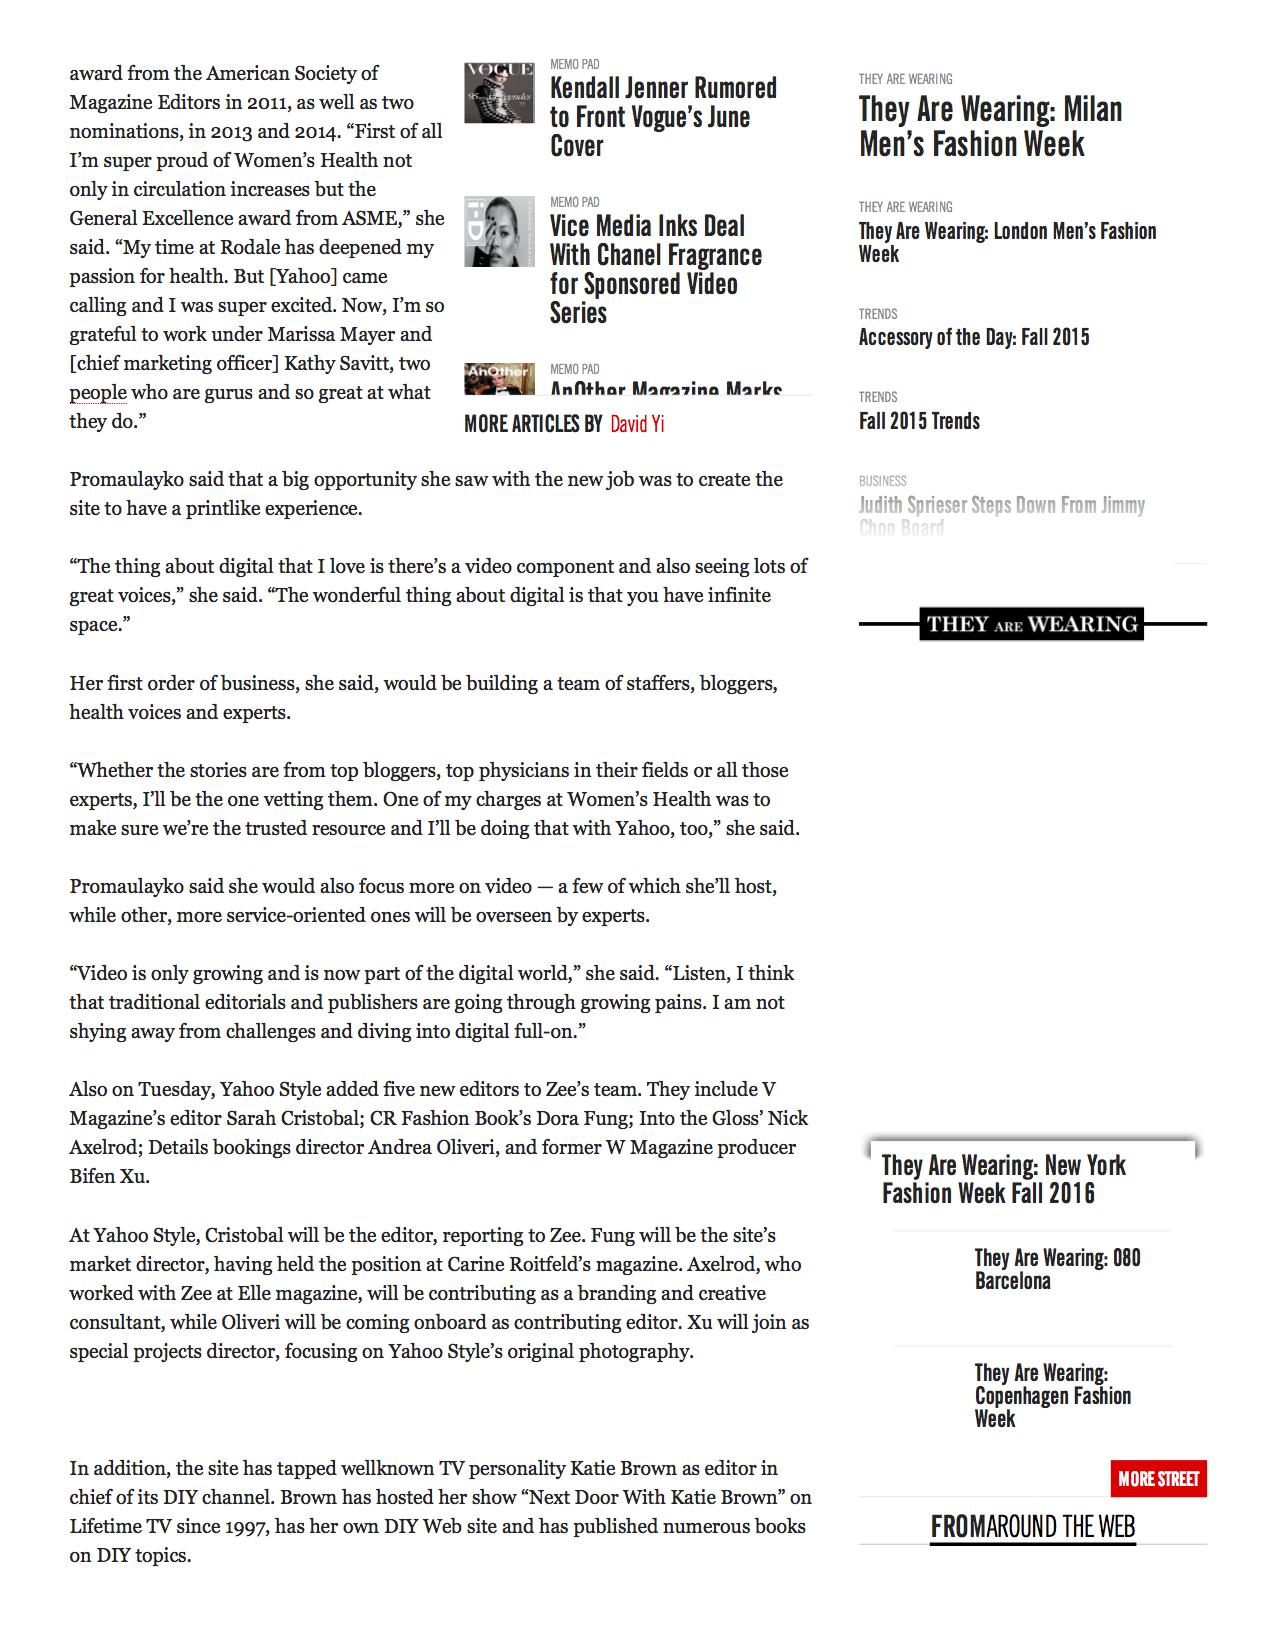 WWD - Michele Promaulayko Tapped to Head Yahoo Health2.jpg